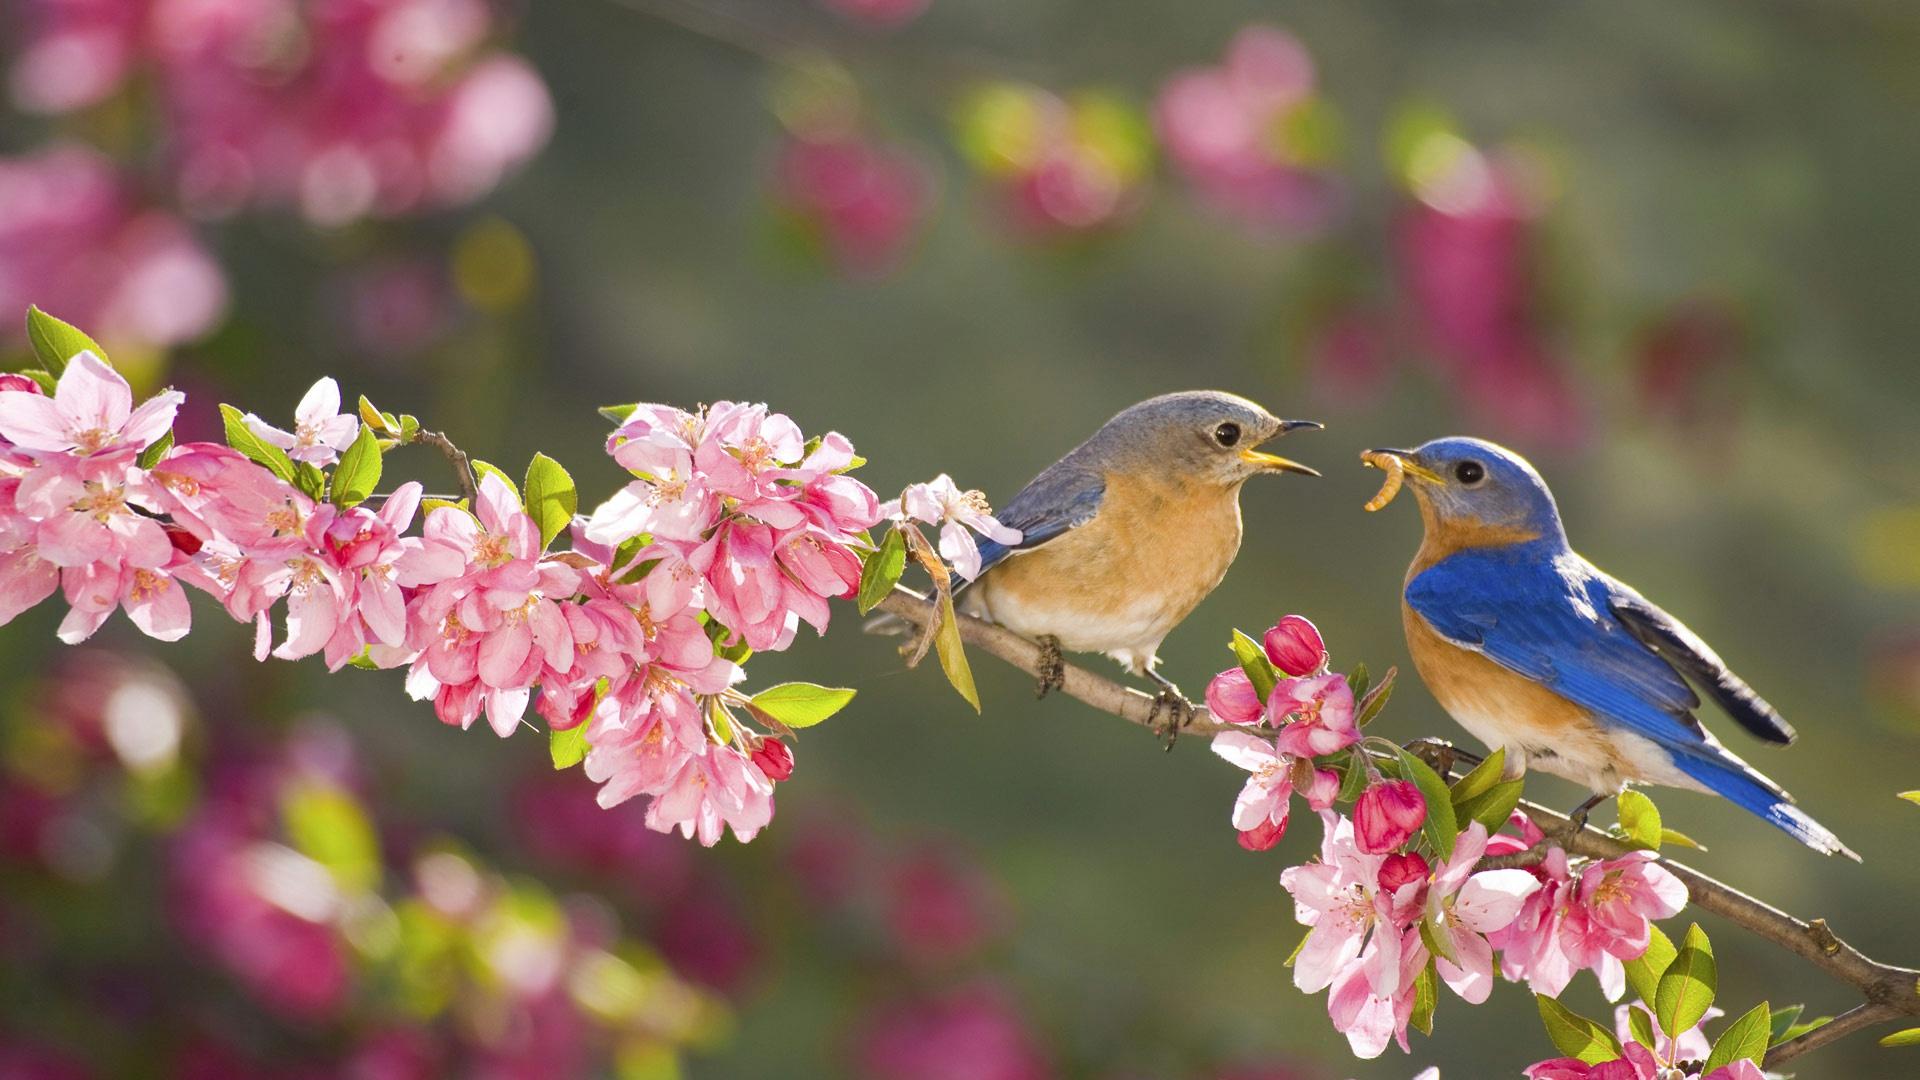 Картинки с птичками цветочками